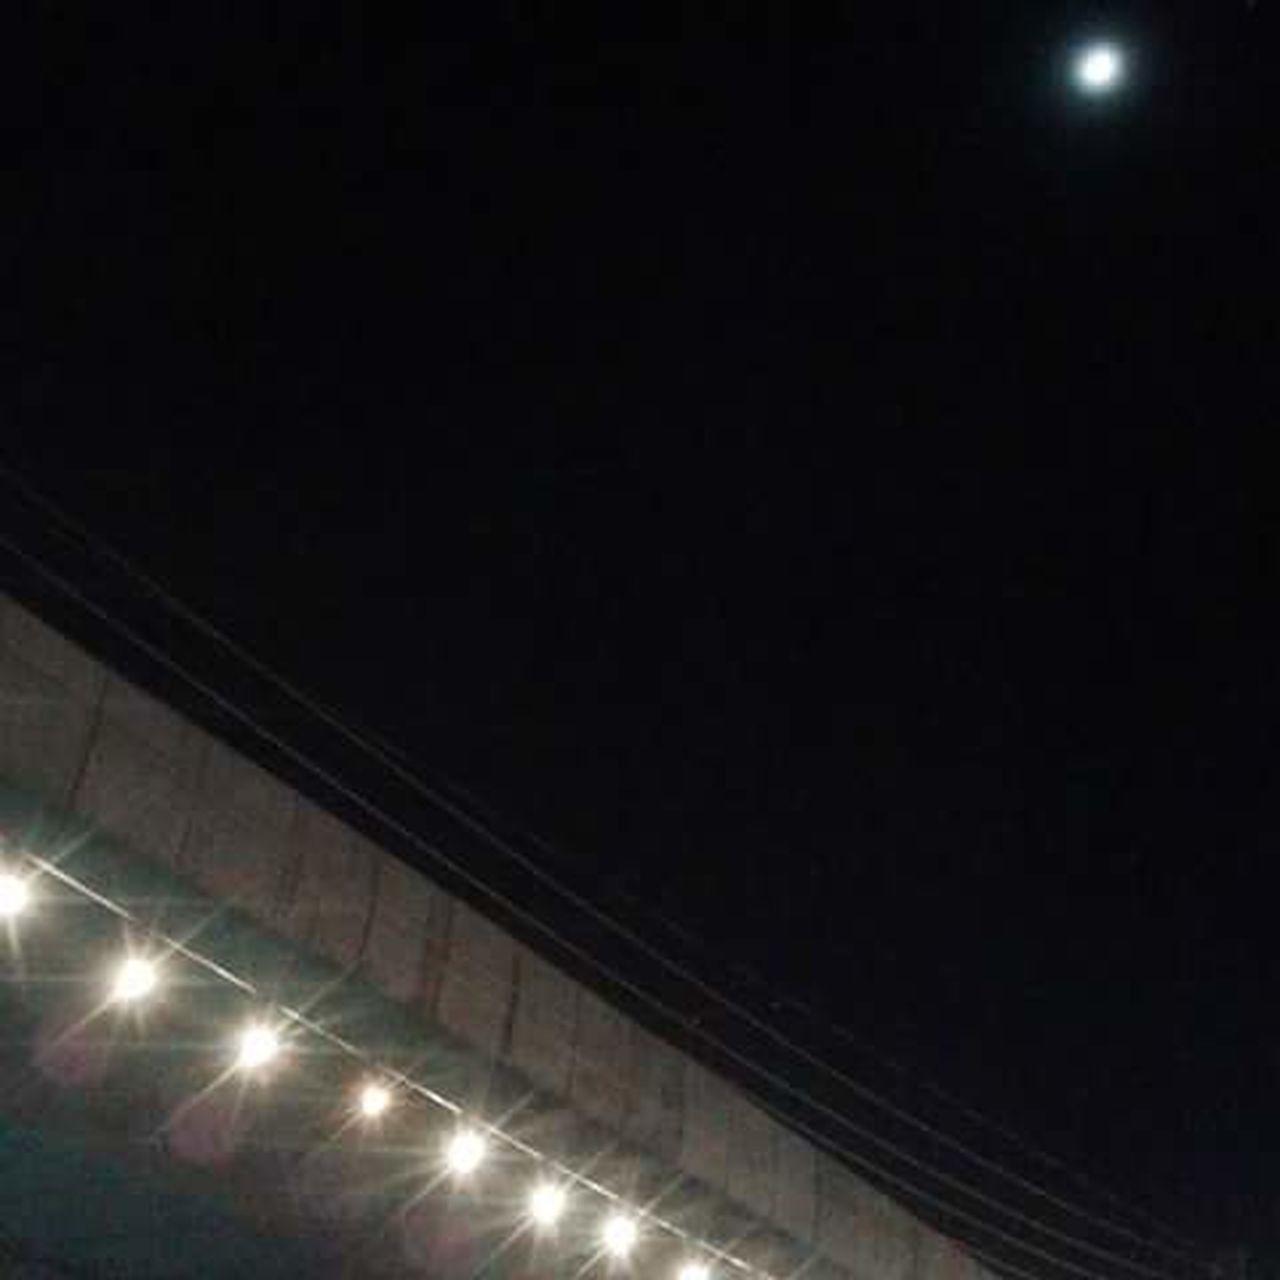 illuminated, night, stadium, indoors, spotlight, no people